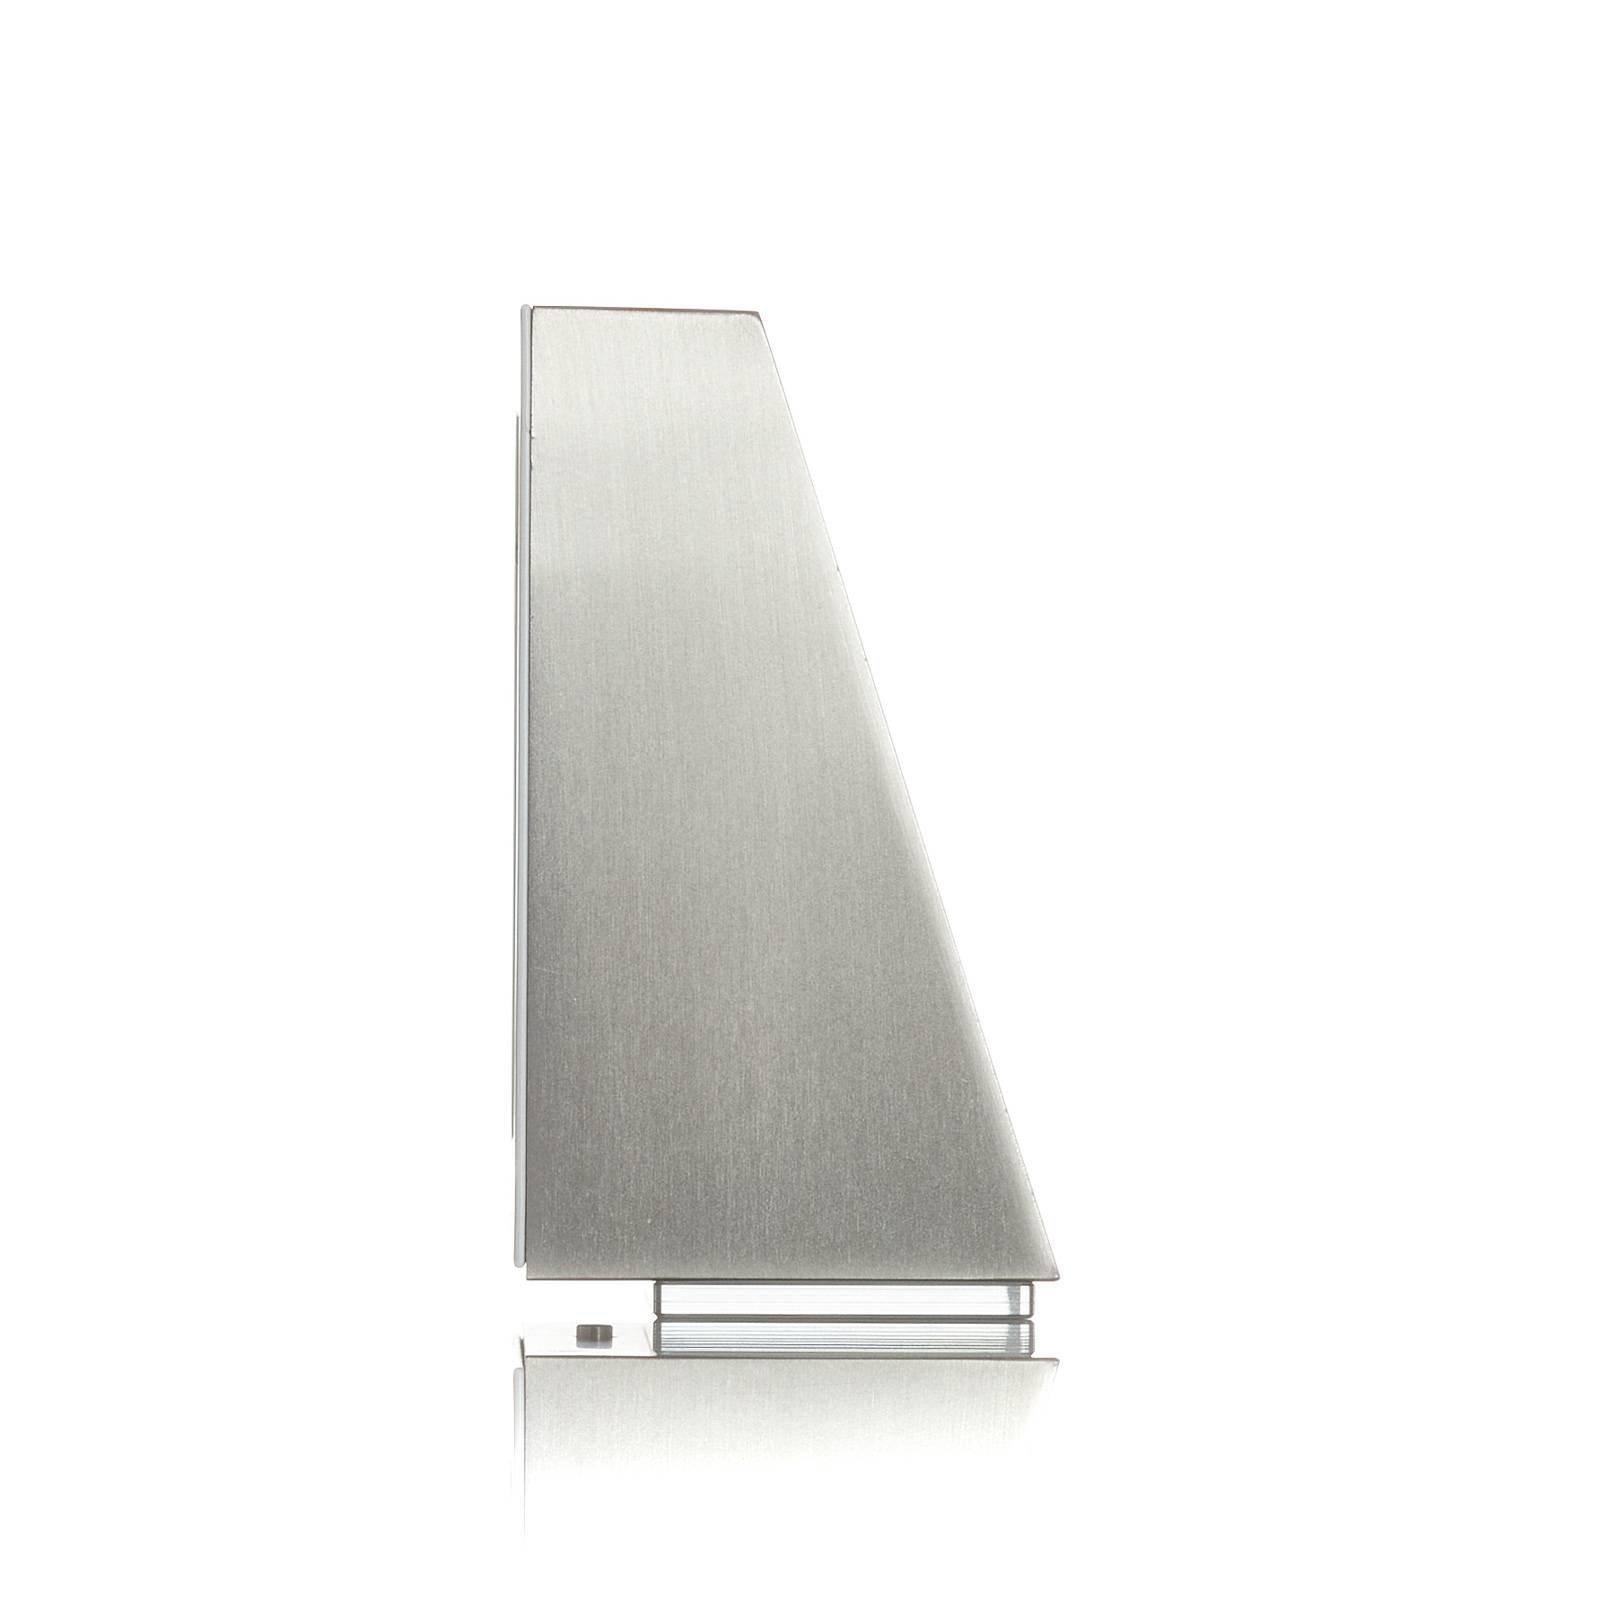 BEGA 78052-vegglampe trapes 3000K 18 cm stål,510lm